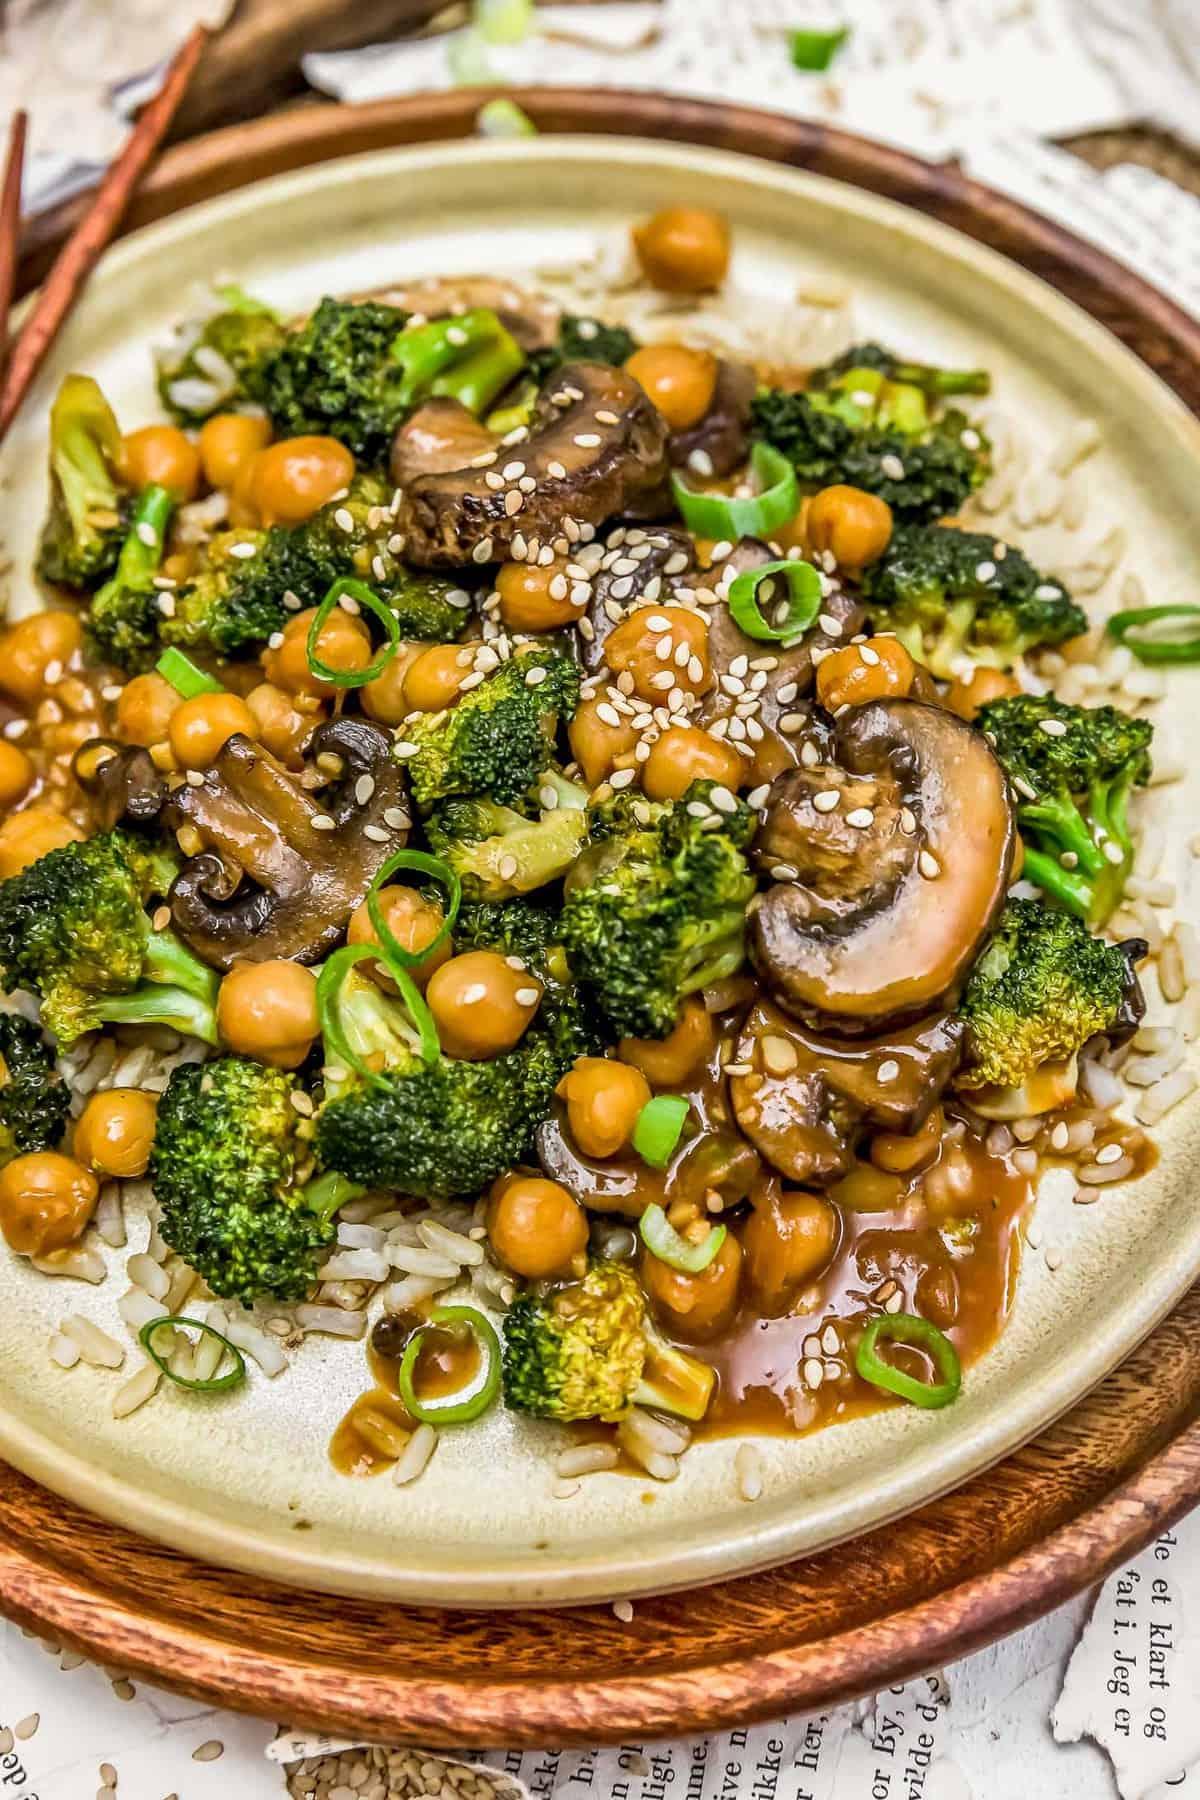 General Tso's Broccoli Mushroom Stir Fry